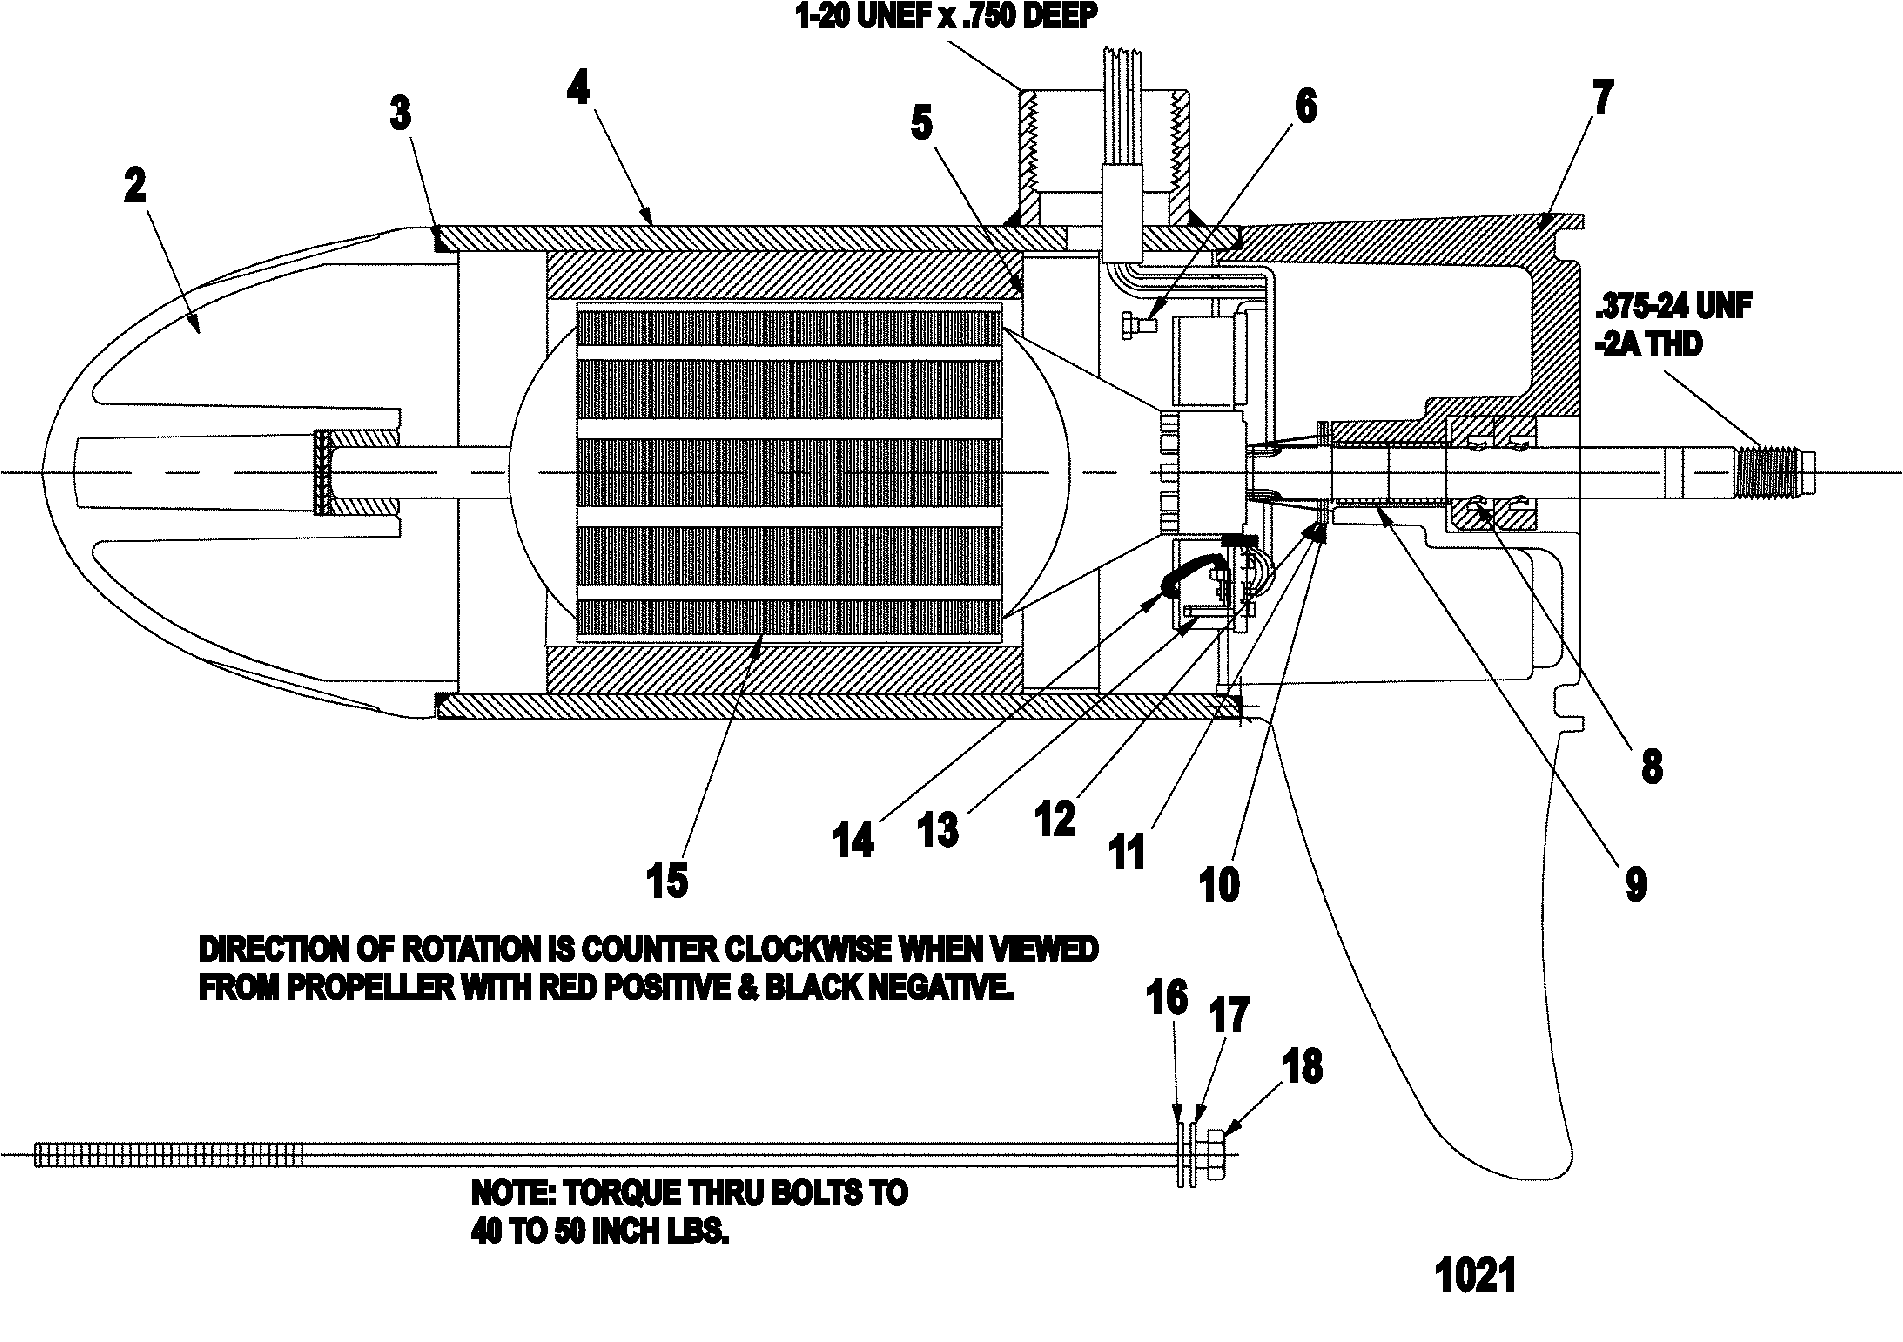 Trolling Motor 9767vb3z1 Wire Diagrammodel 767p 24 Volt Diagram